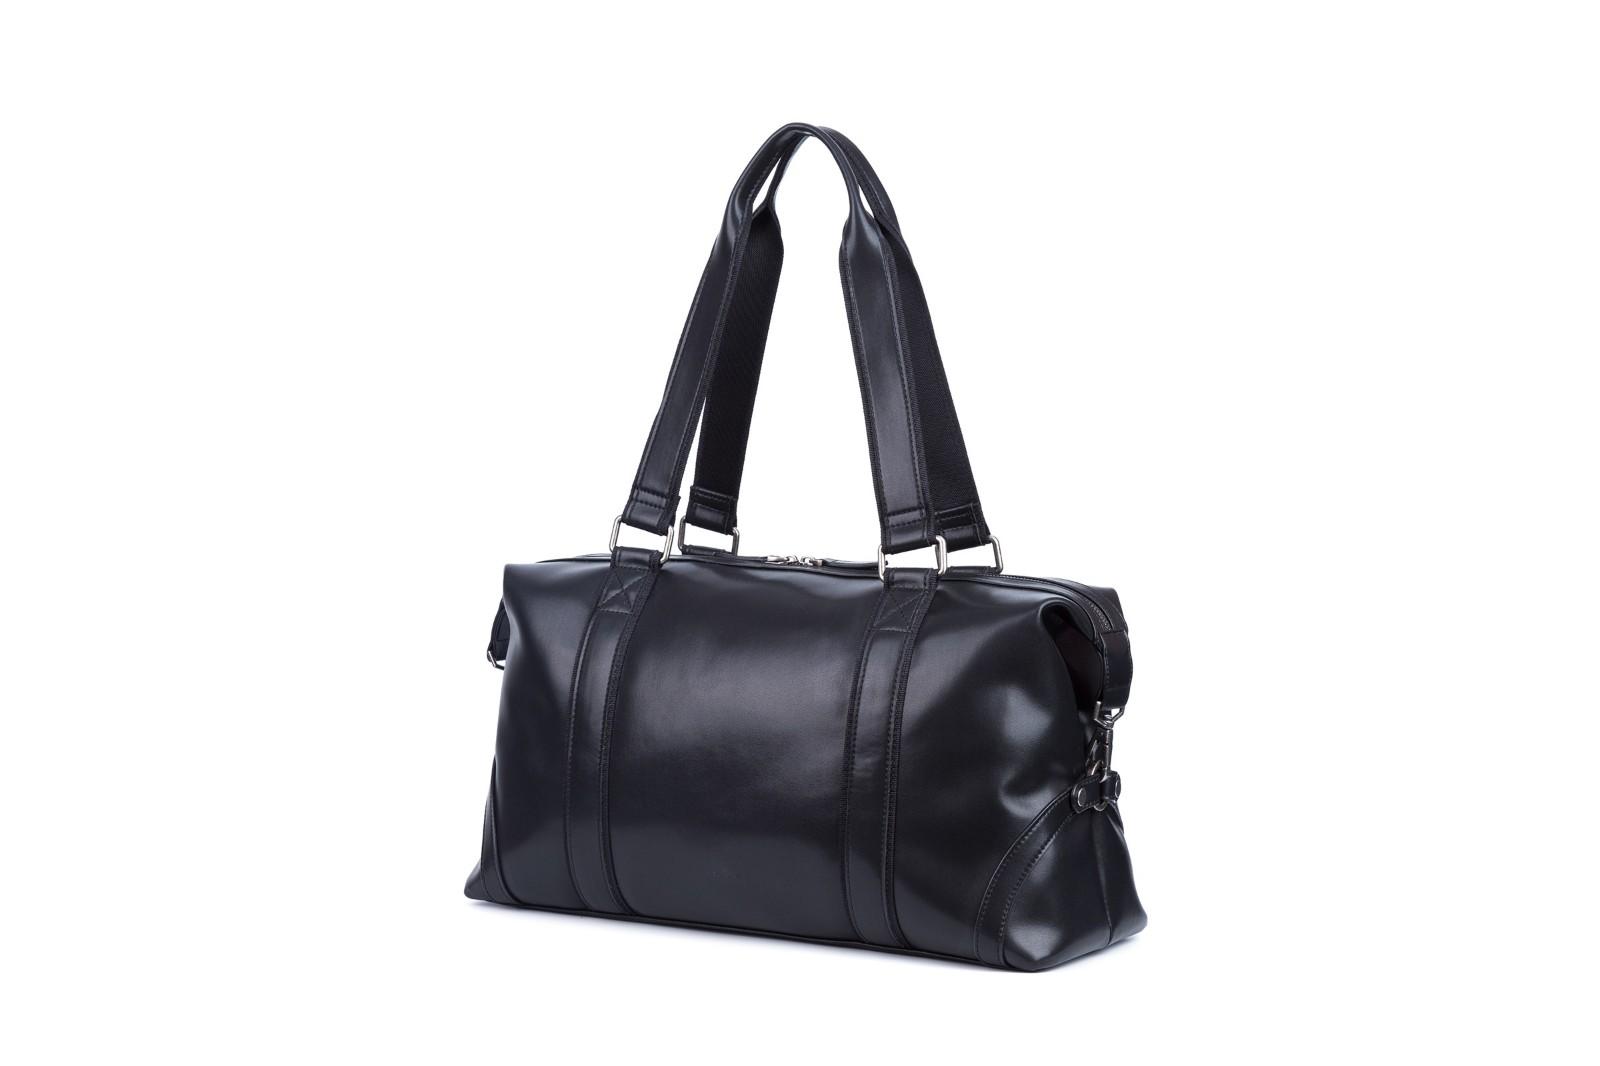 GF bags-Leather Duffle Bag Mens Duffle Leather Handle Metal Zipper Closure-2